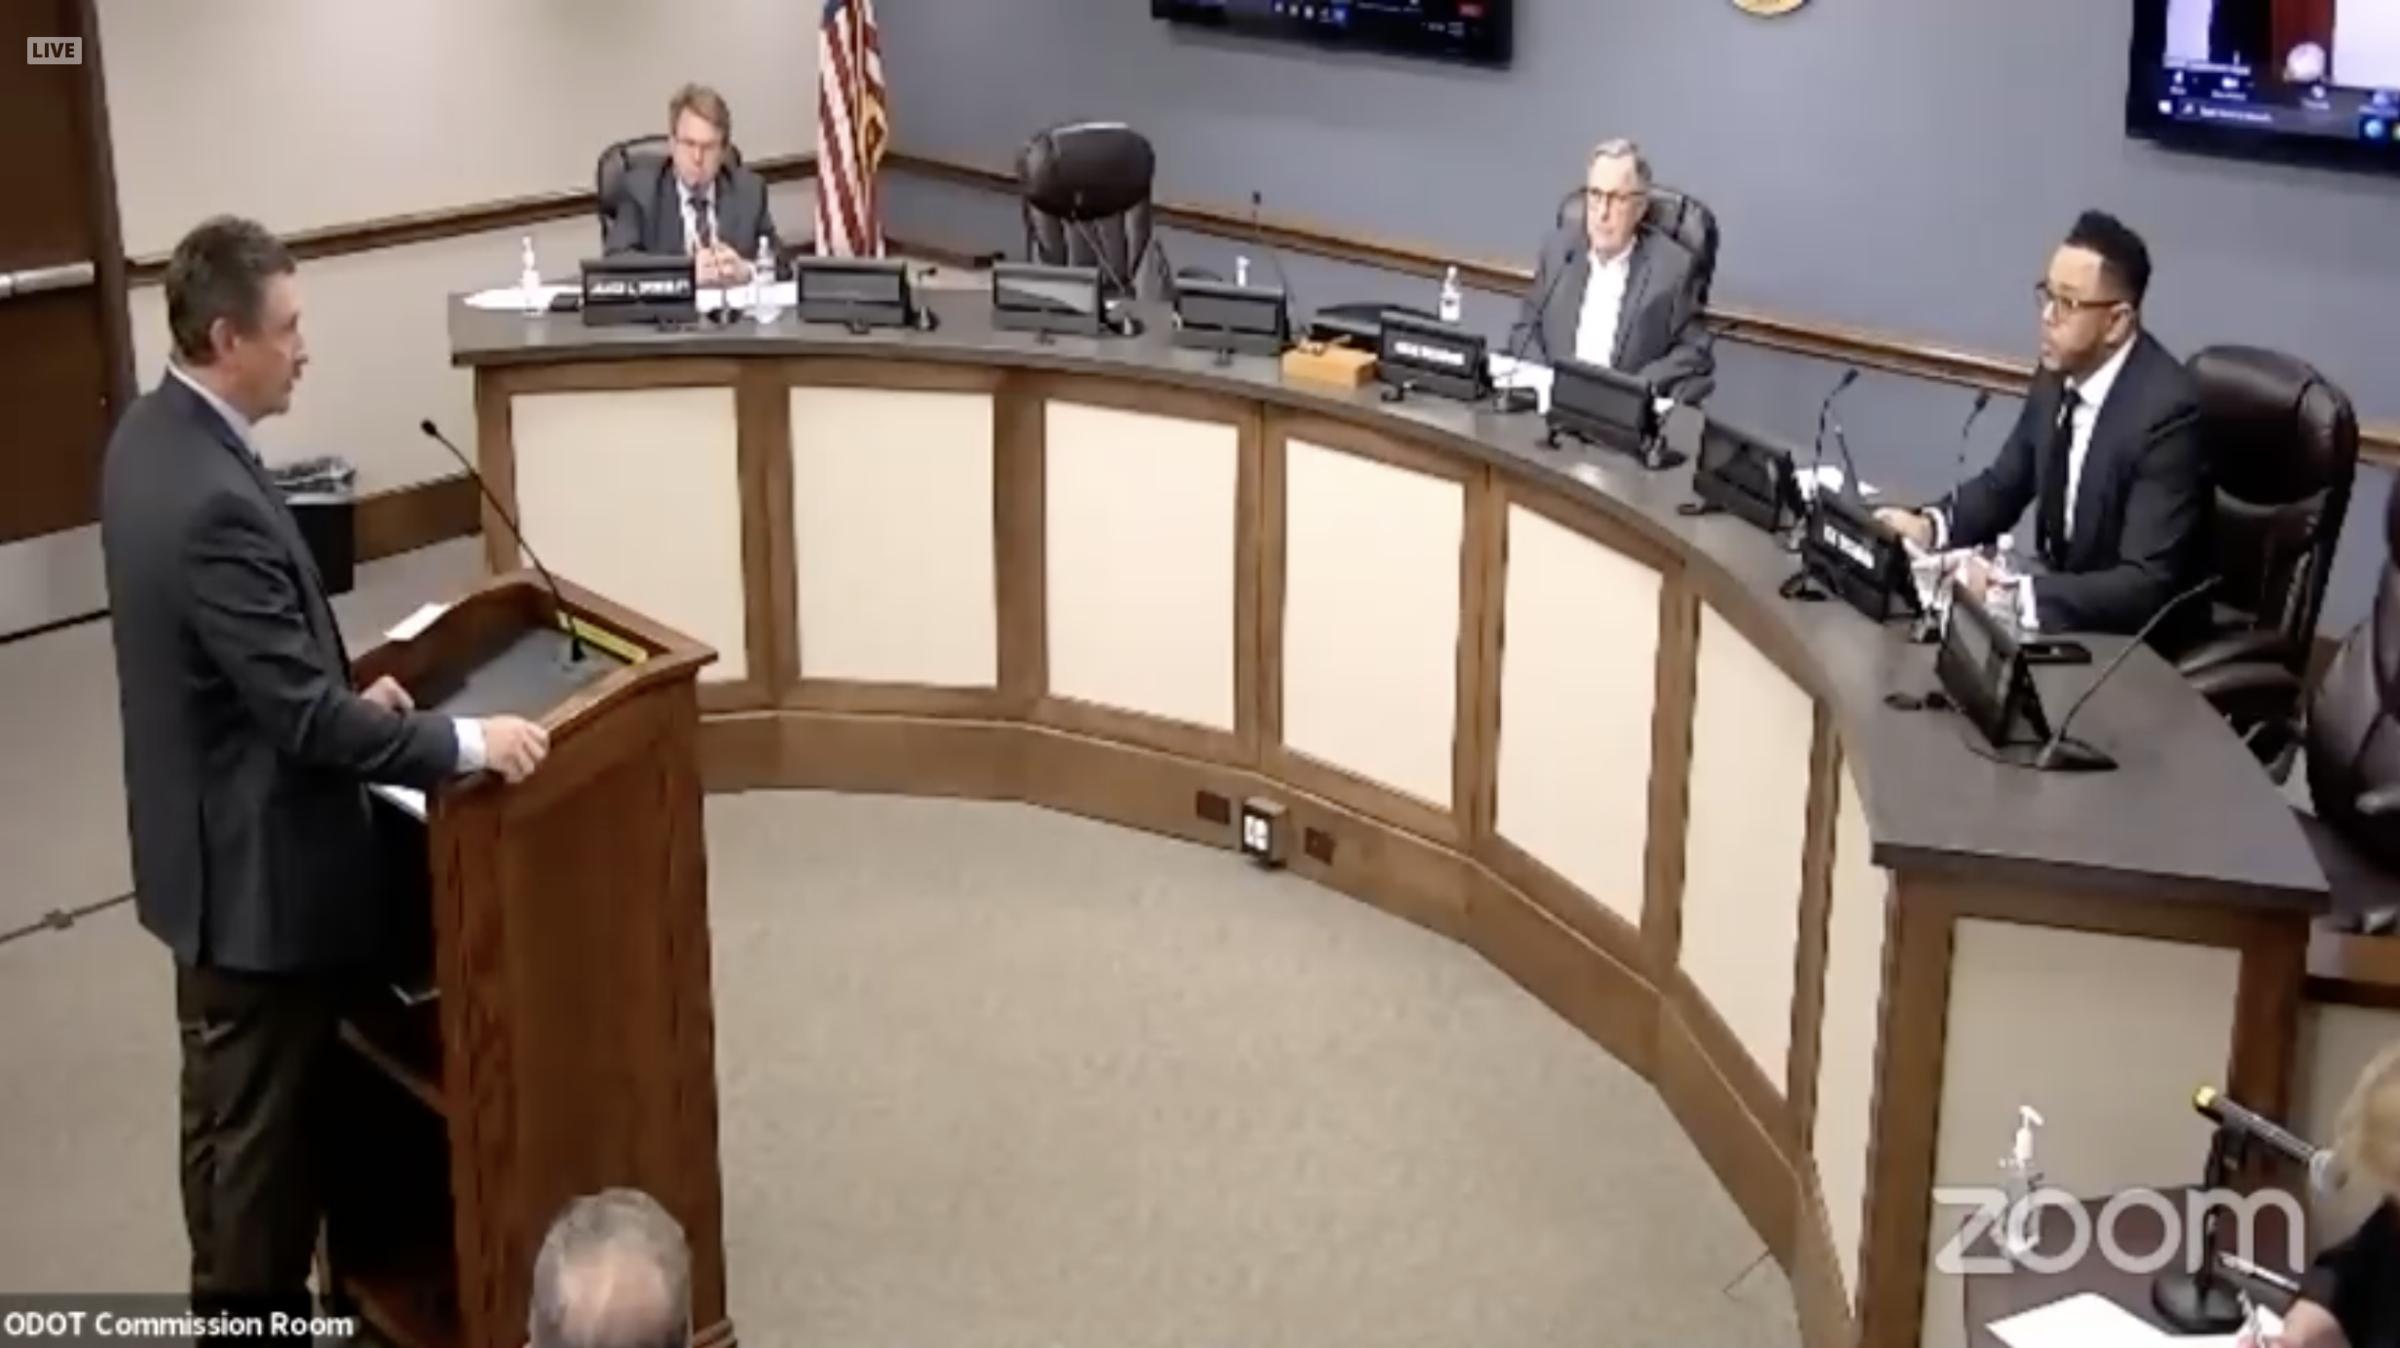 Transportation Secretary Says Deficiencies, Not Governor's Office, Led To  I-35 Project Delay   Public Radio Tulsa